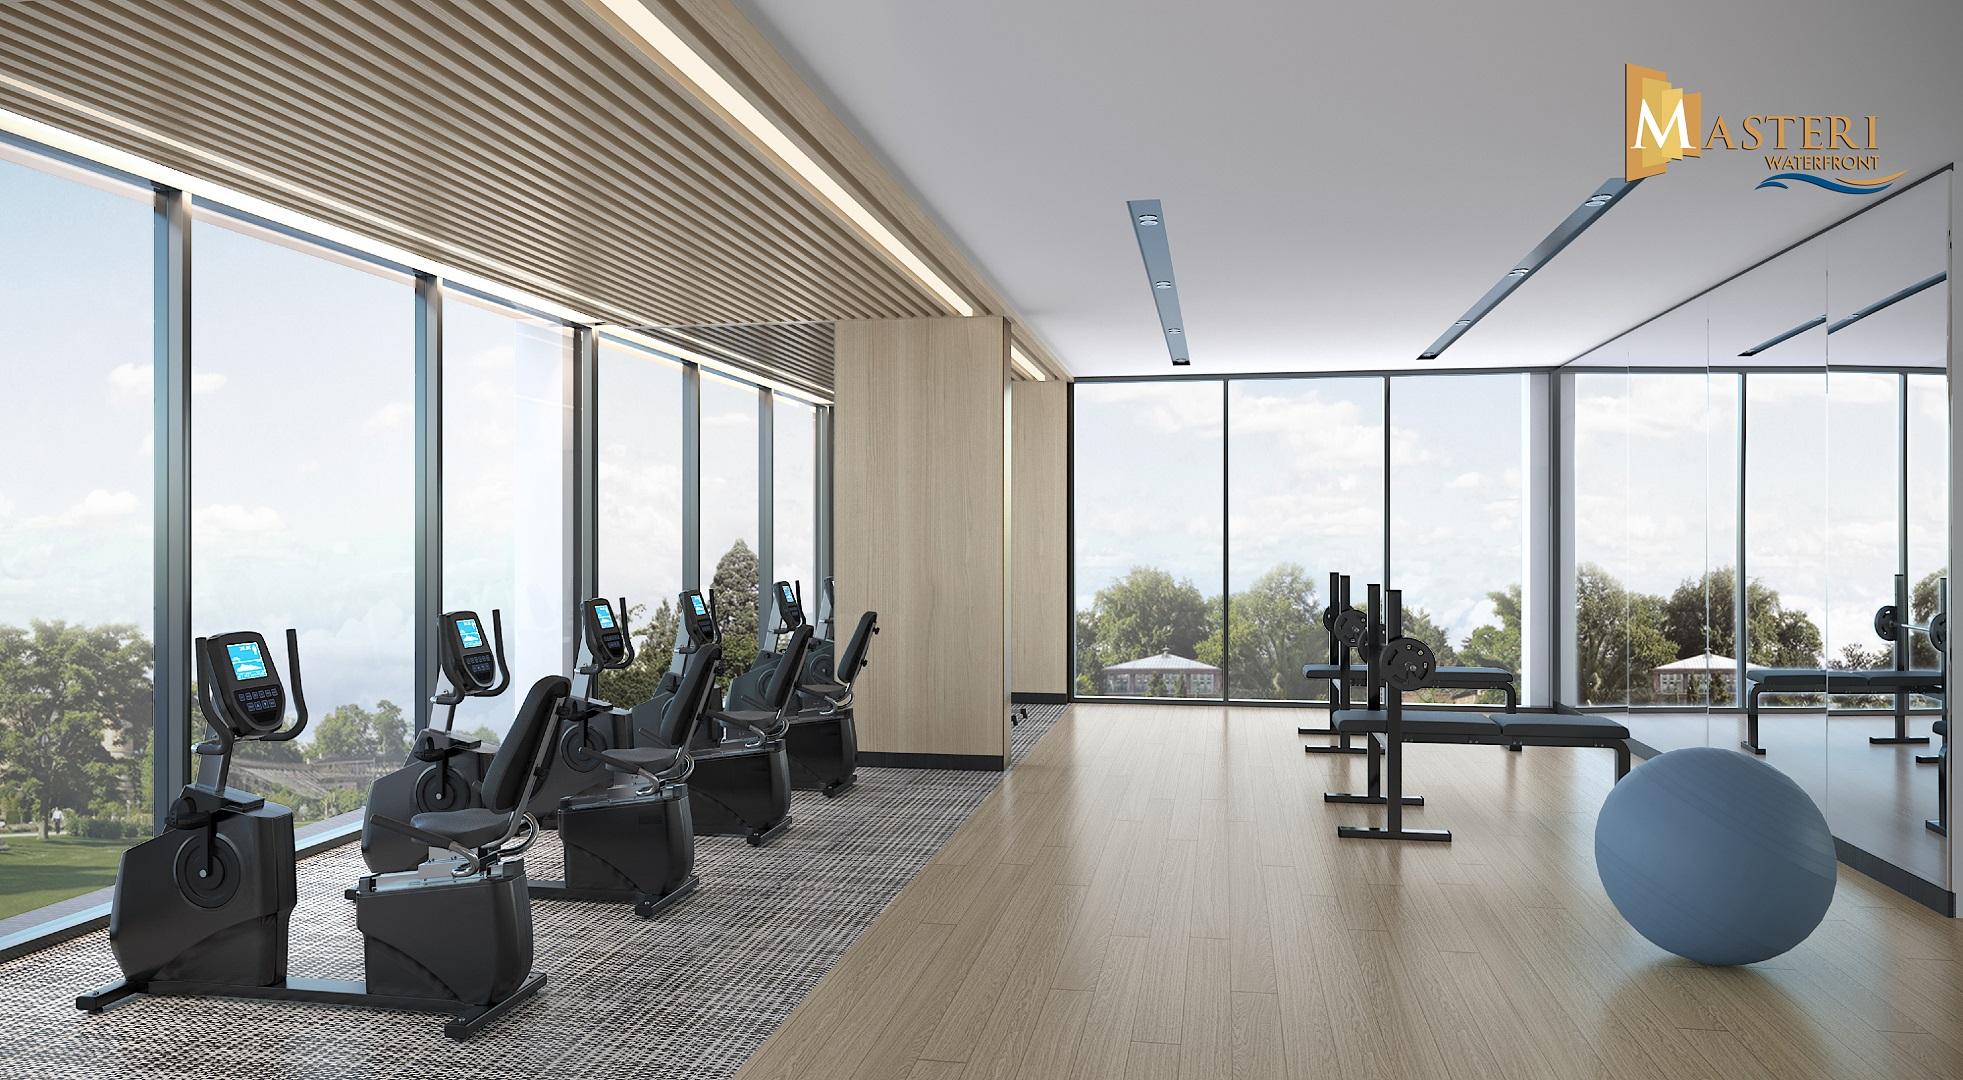 phòng gym masteri waterfront ocean park